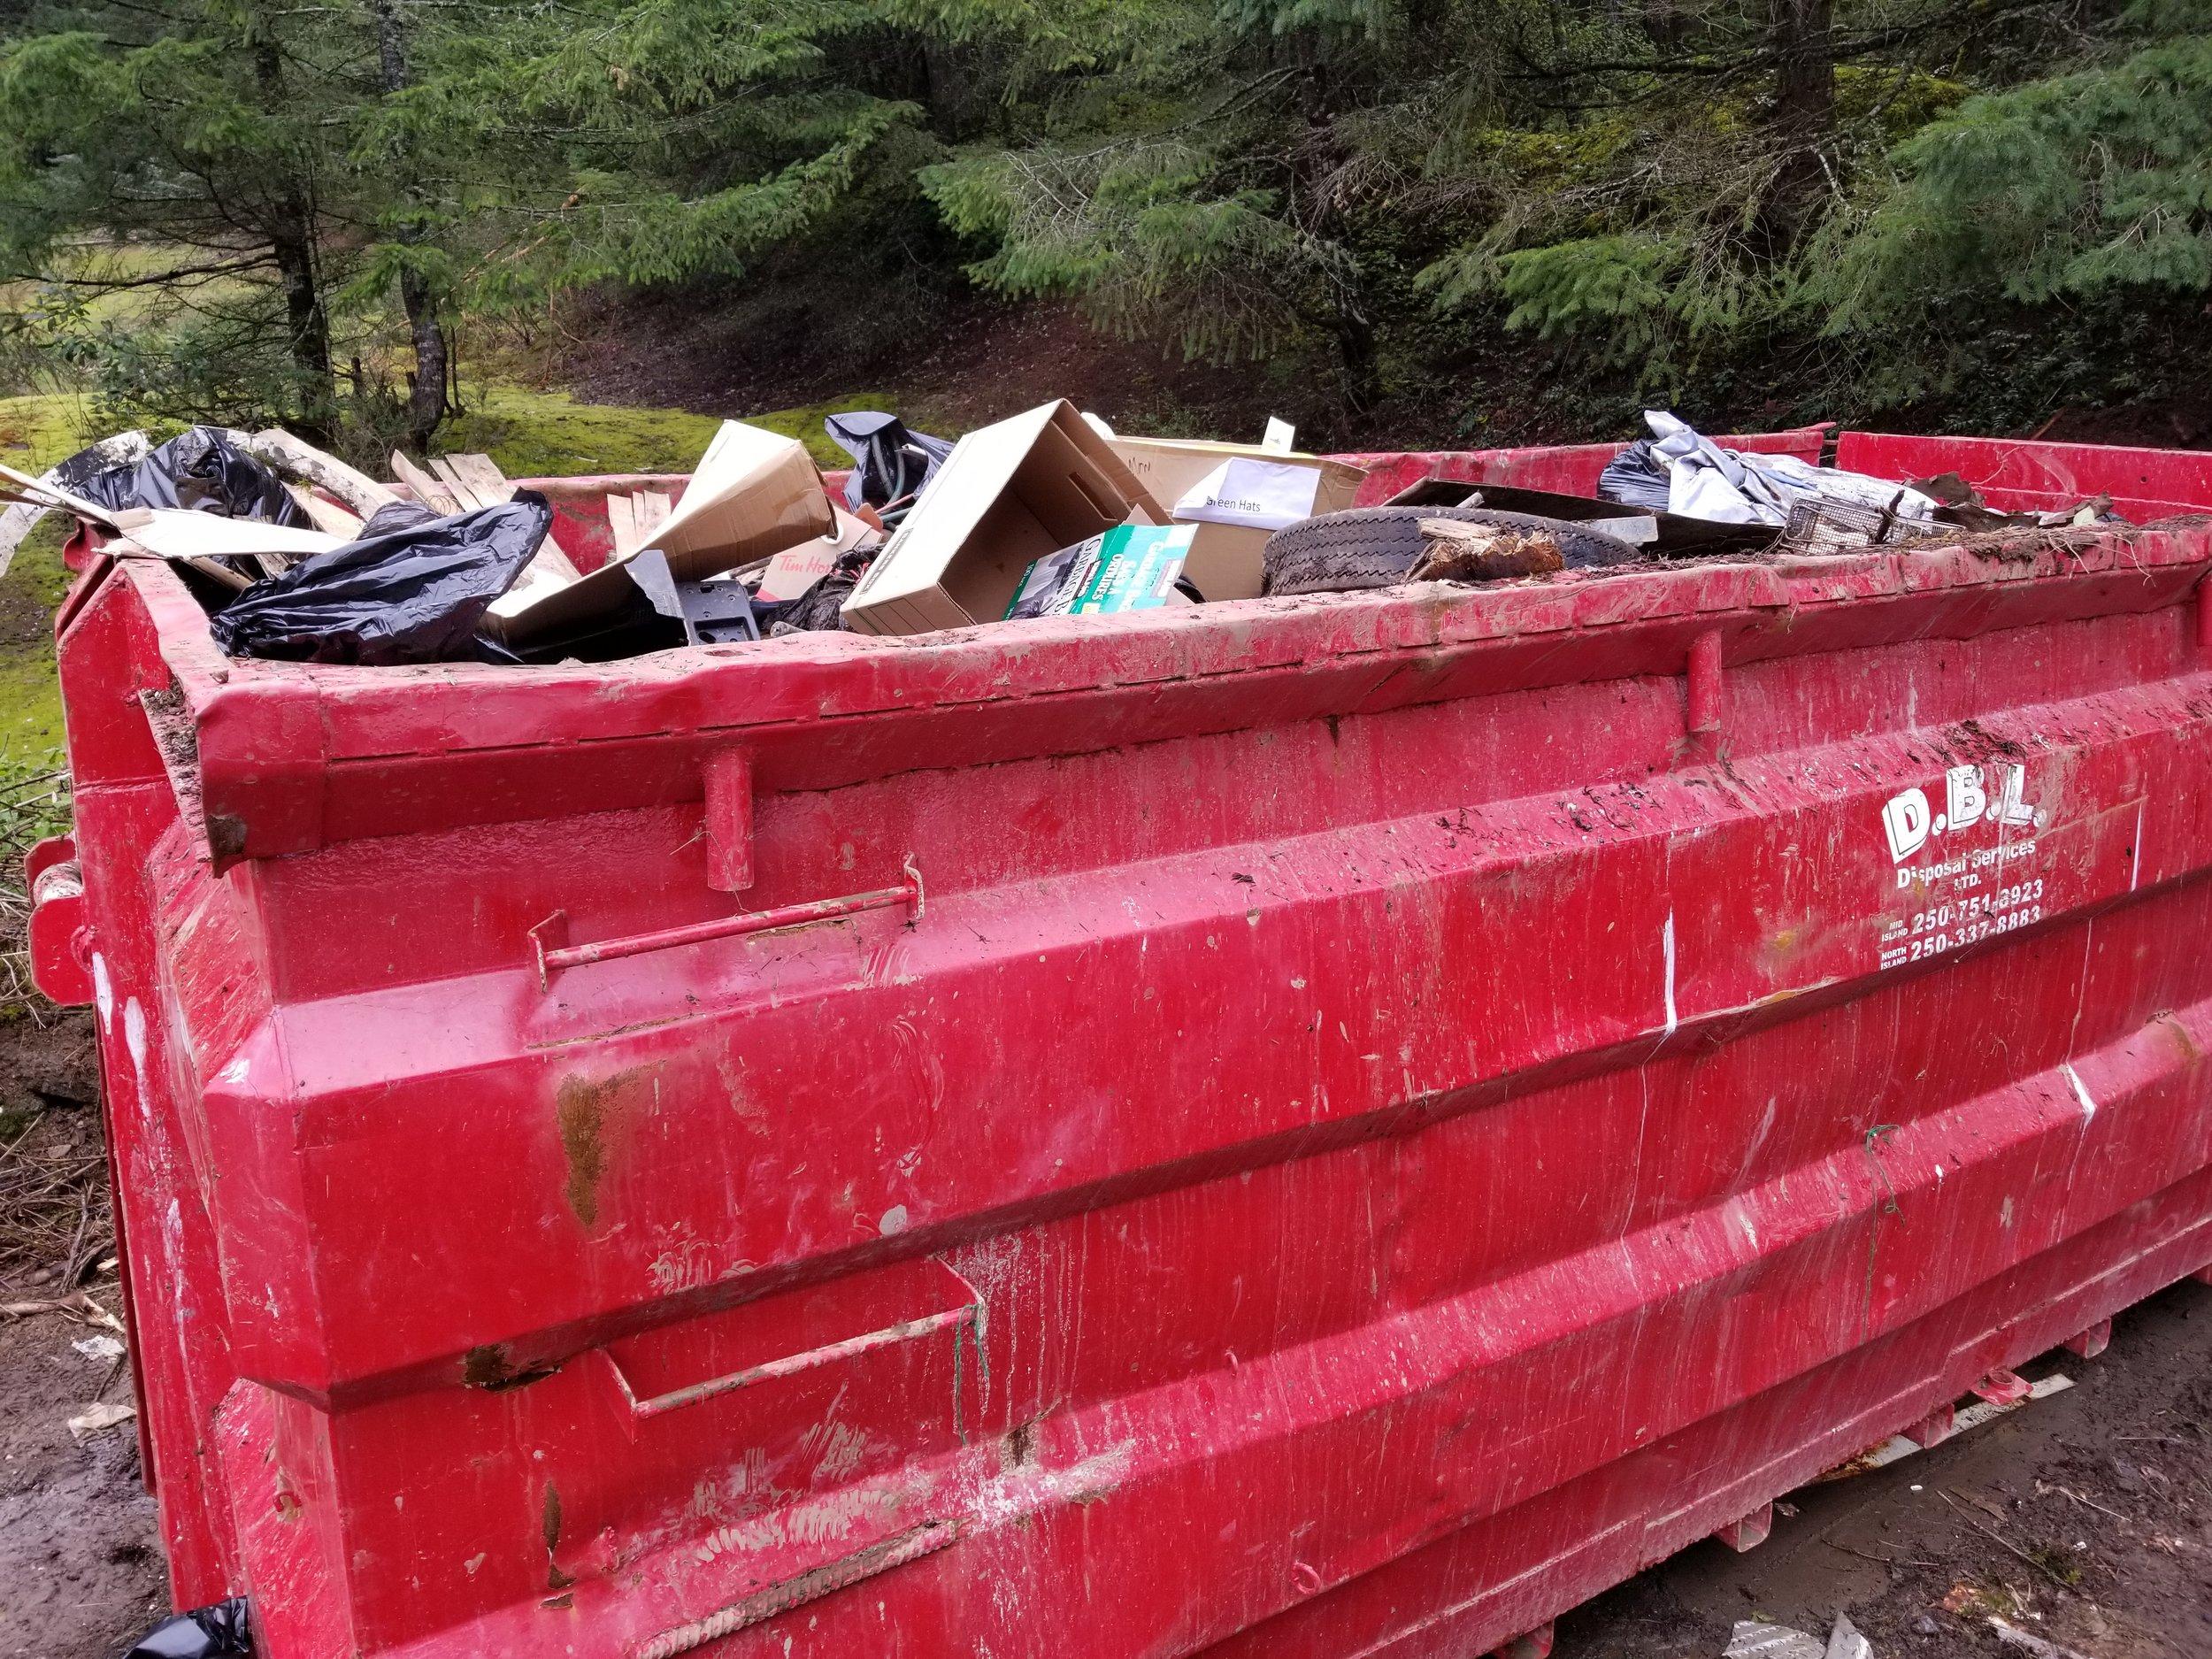 cowichan bay trash cleanup 2.jpg